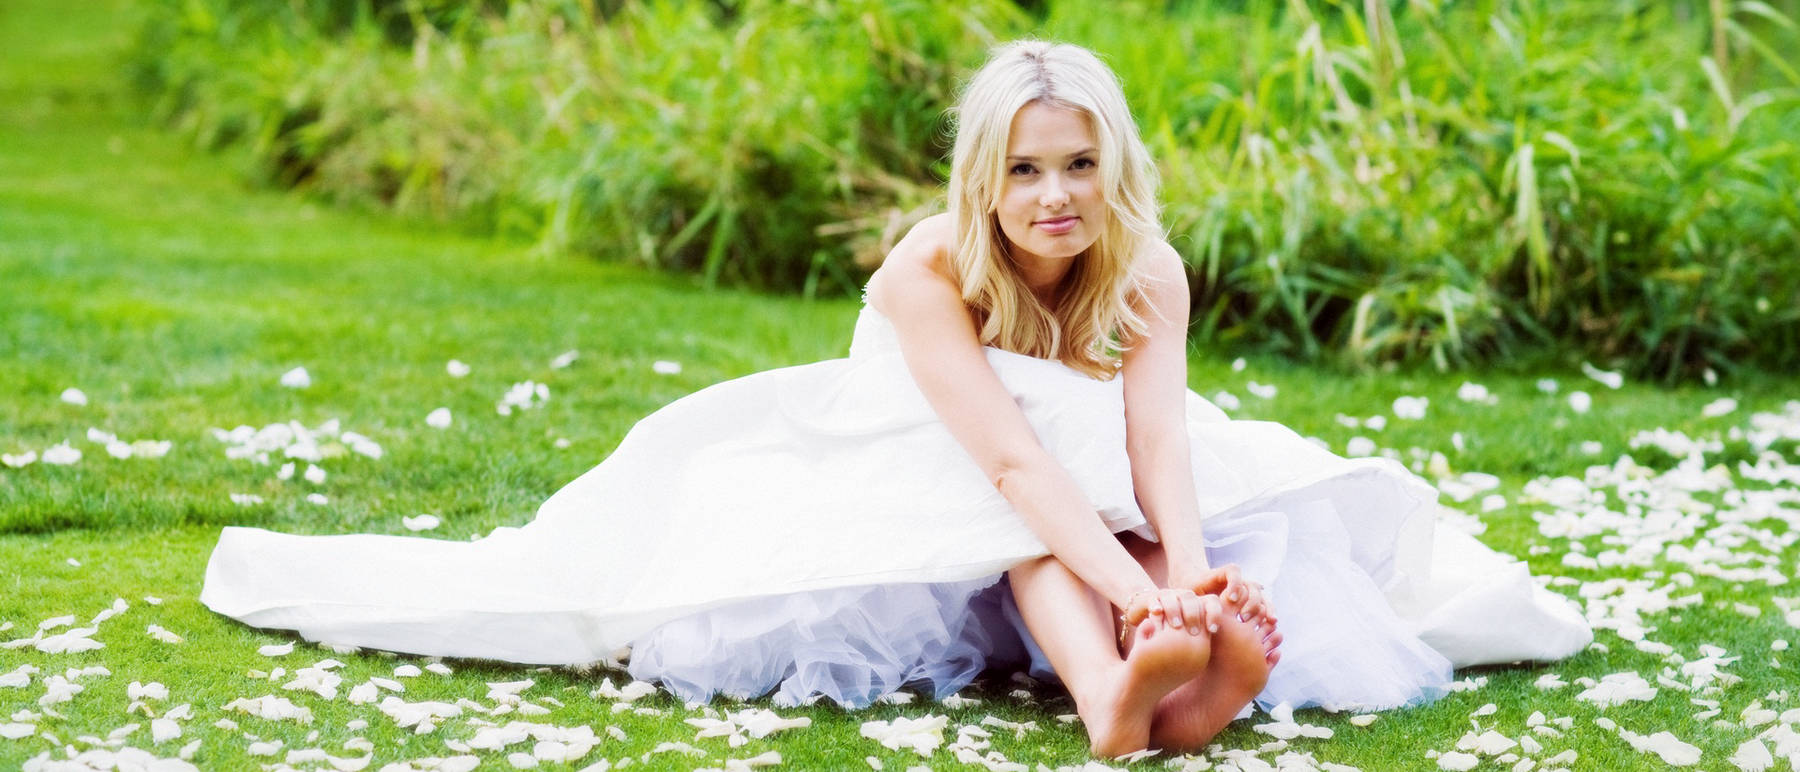 johnandjoseph-wedding-photographer-hz-slider-106